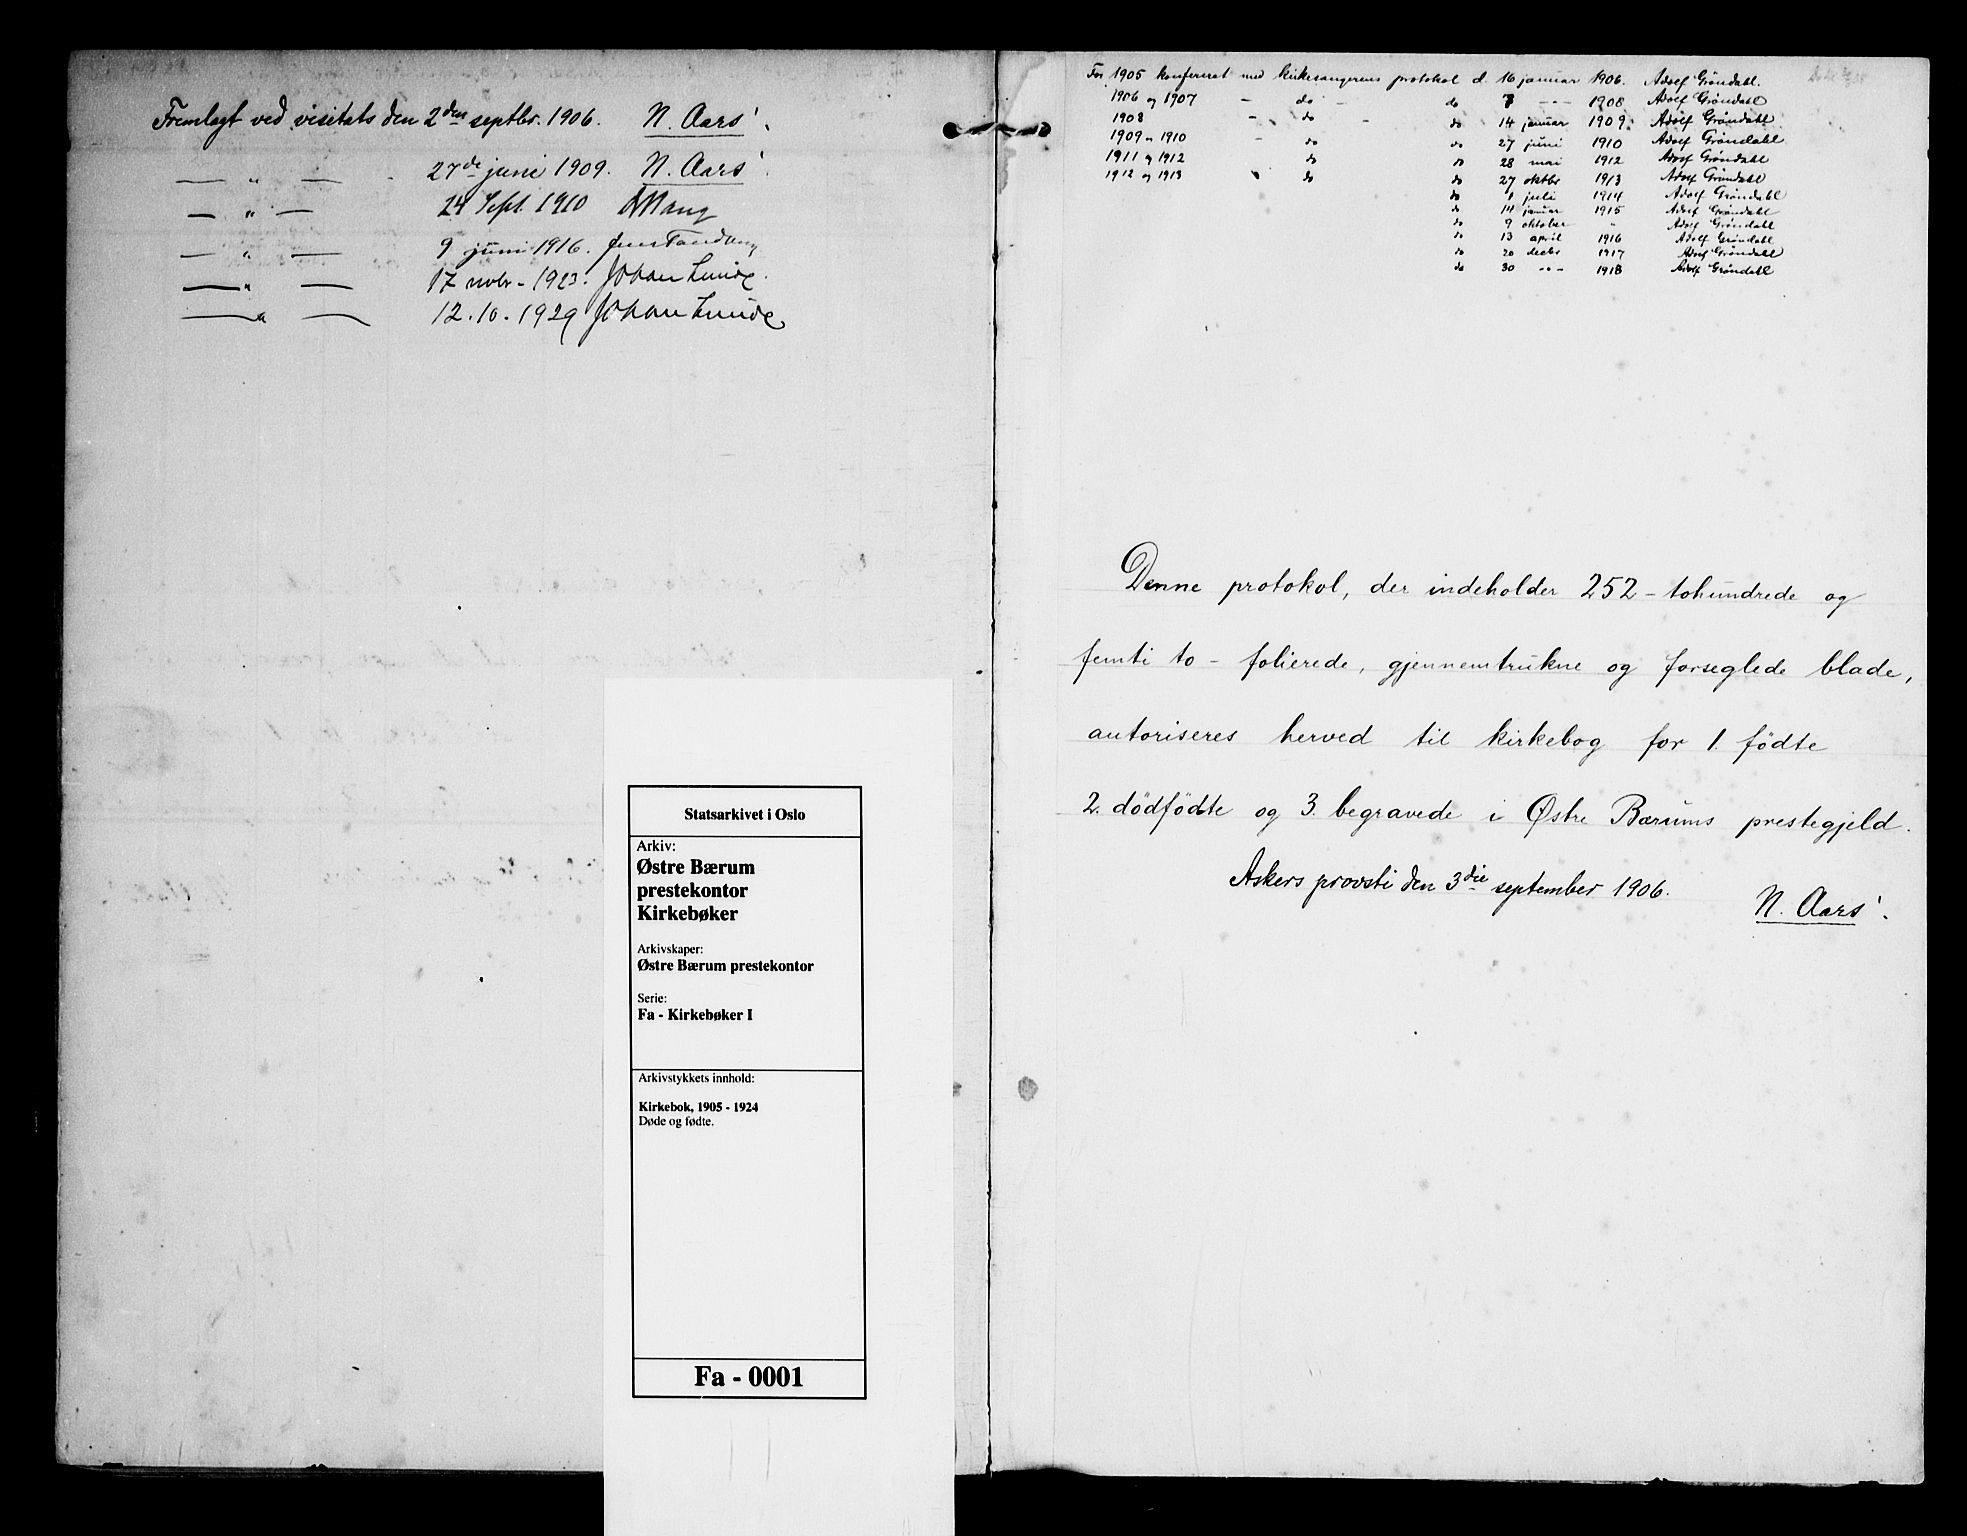 SAO, Østre Bærum prestekontor Kirkebøker, F/Fa/L0001: Ministerialbok nr. 1, 1905-1924